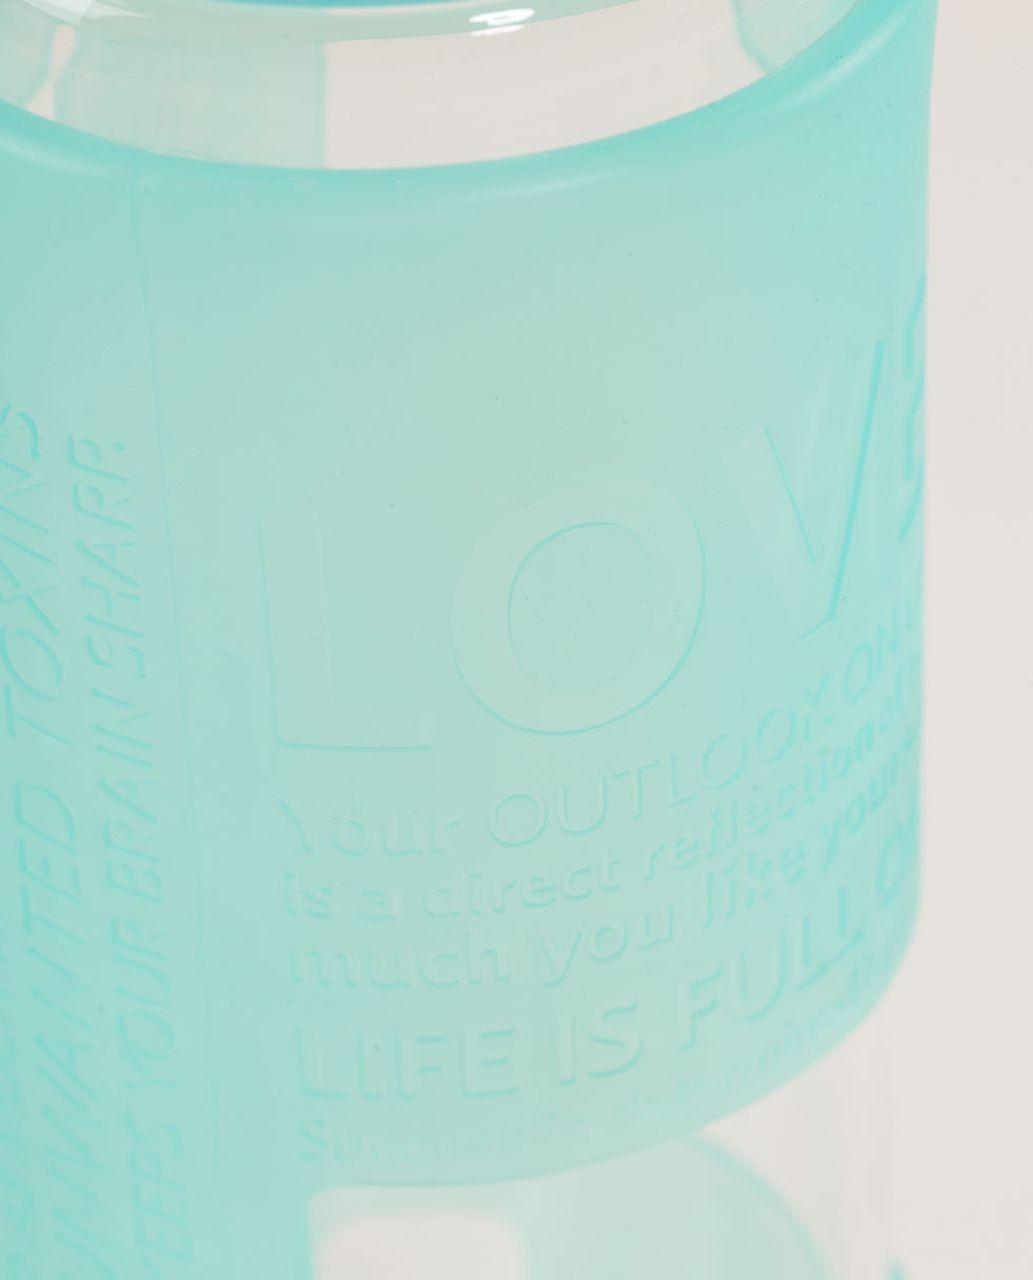 Lululemon Pure Balance Water Bottle - Angel Blue